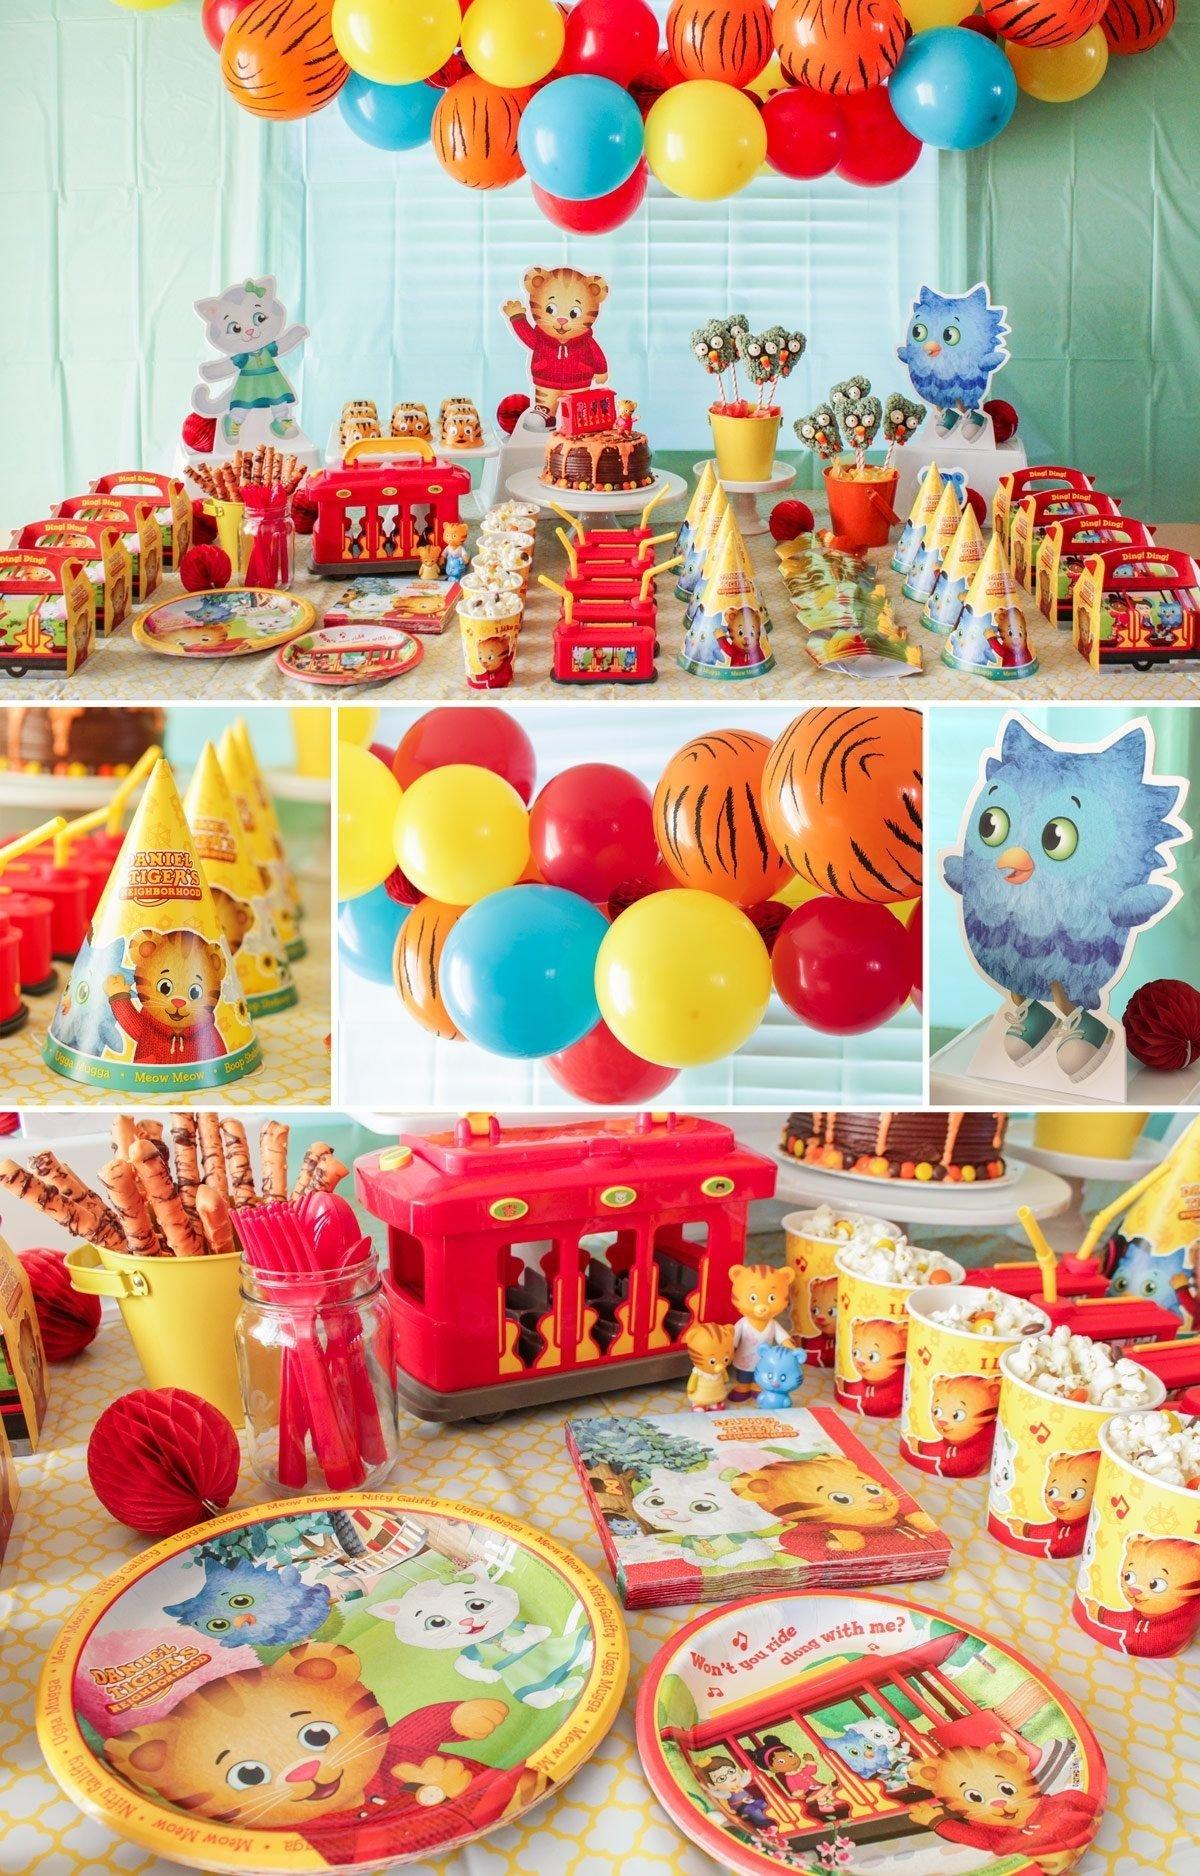 10 Famous Daniel Tiger Birthday Party Ideas daniel tiger decorations daniel tiger party ideas pinterest 2021